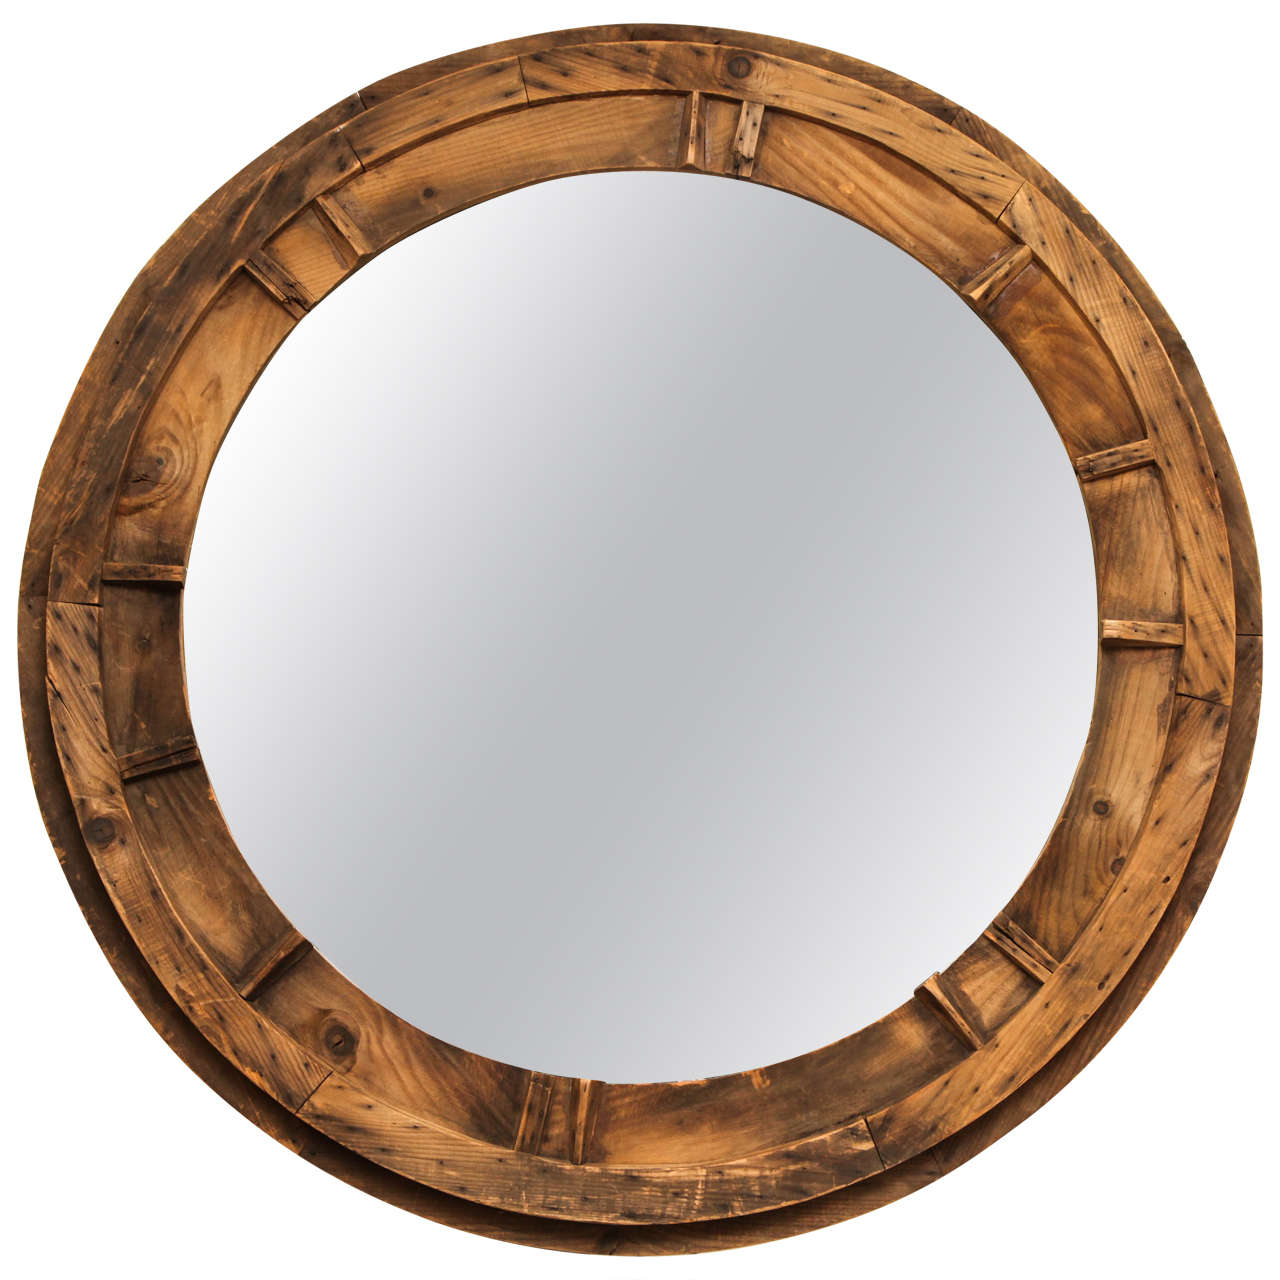 Large Round Sandmold Mirror At 1stdibs